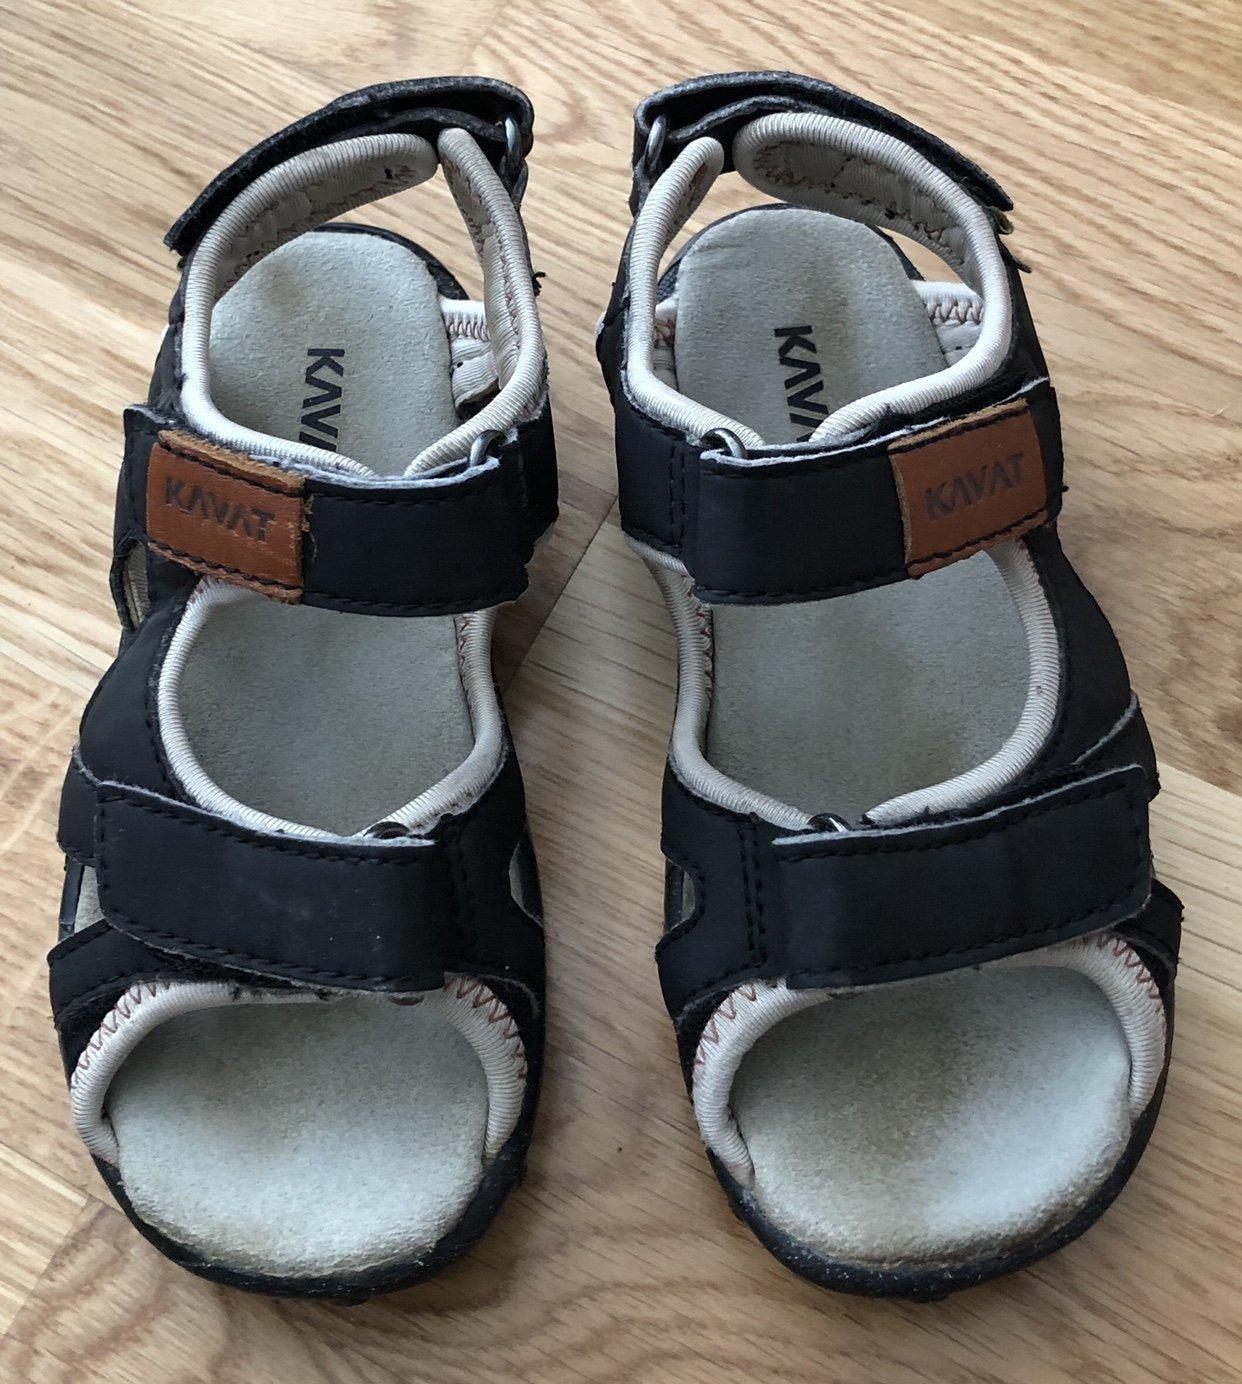 ea43a9b5040 Kavat Rio sandaler i strl 28, svart, barnskor (351559815) ᐈ EMIBOX ...